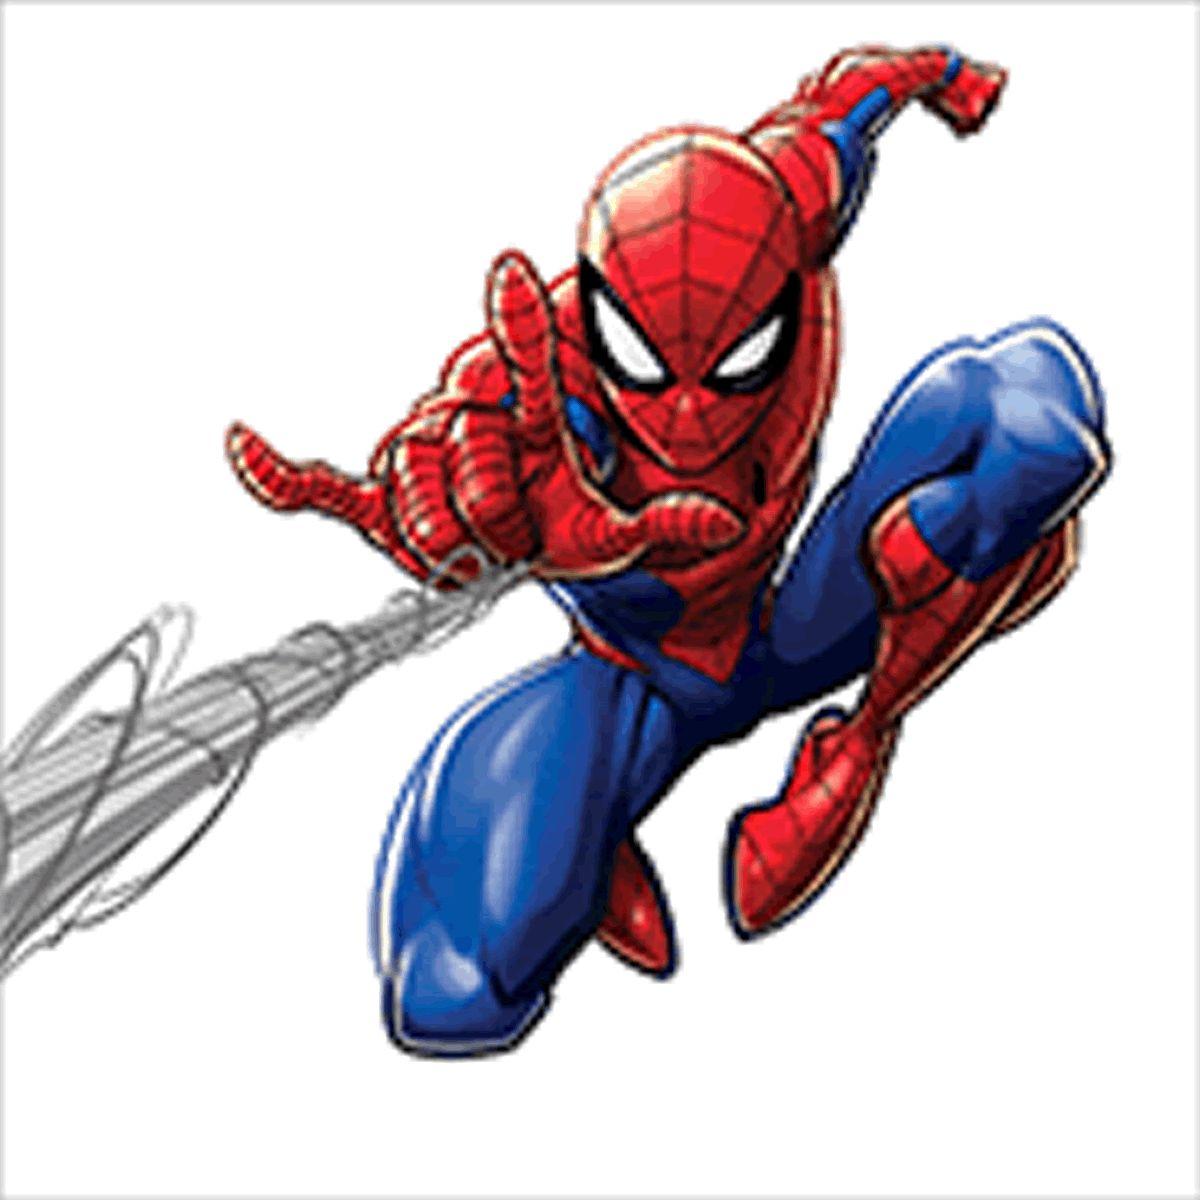 645b312cf Spiderman Kids Character Shirts & Clothing - Macy's